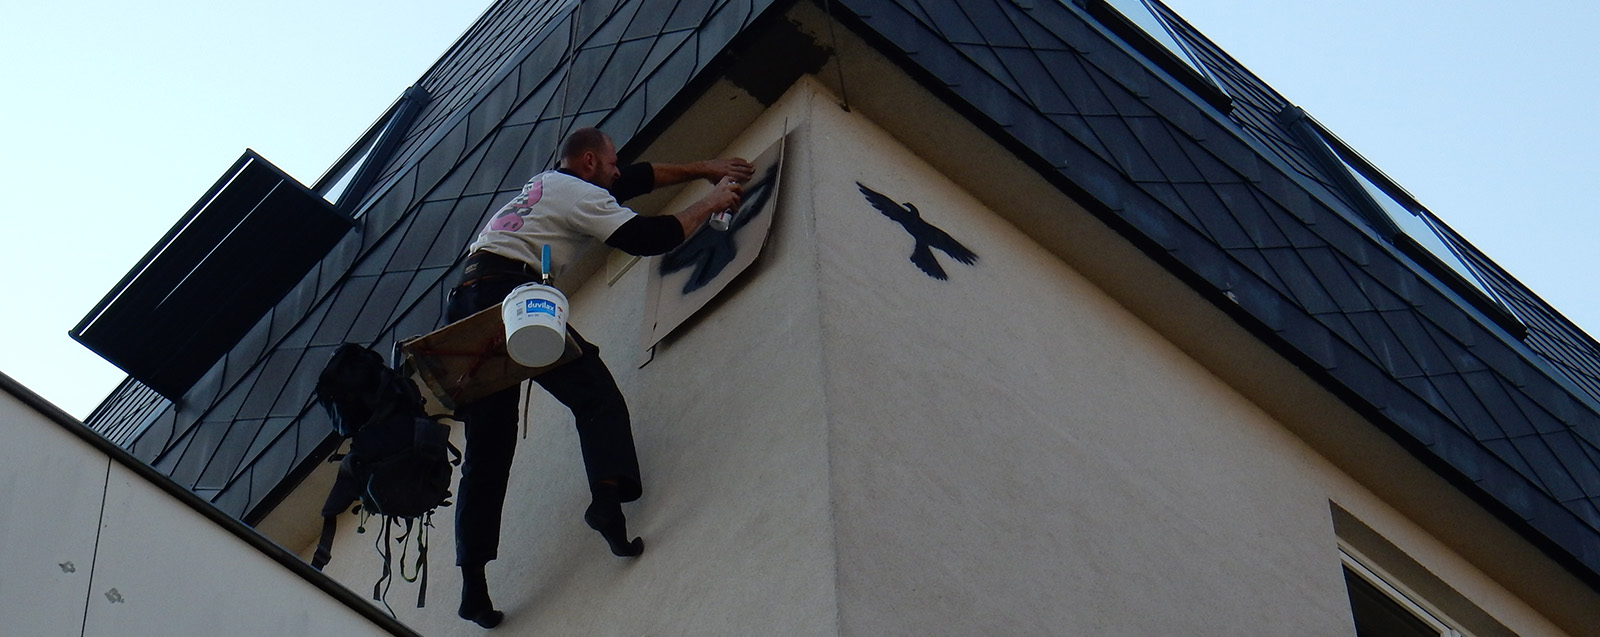 nastrik siluety dravce na fasadu